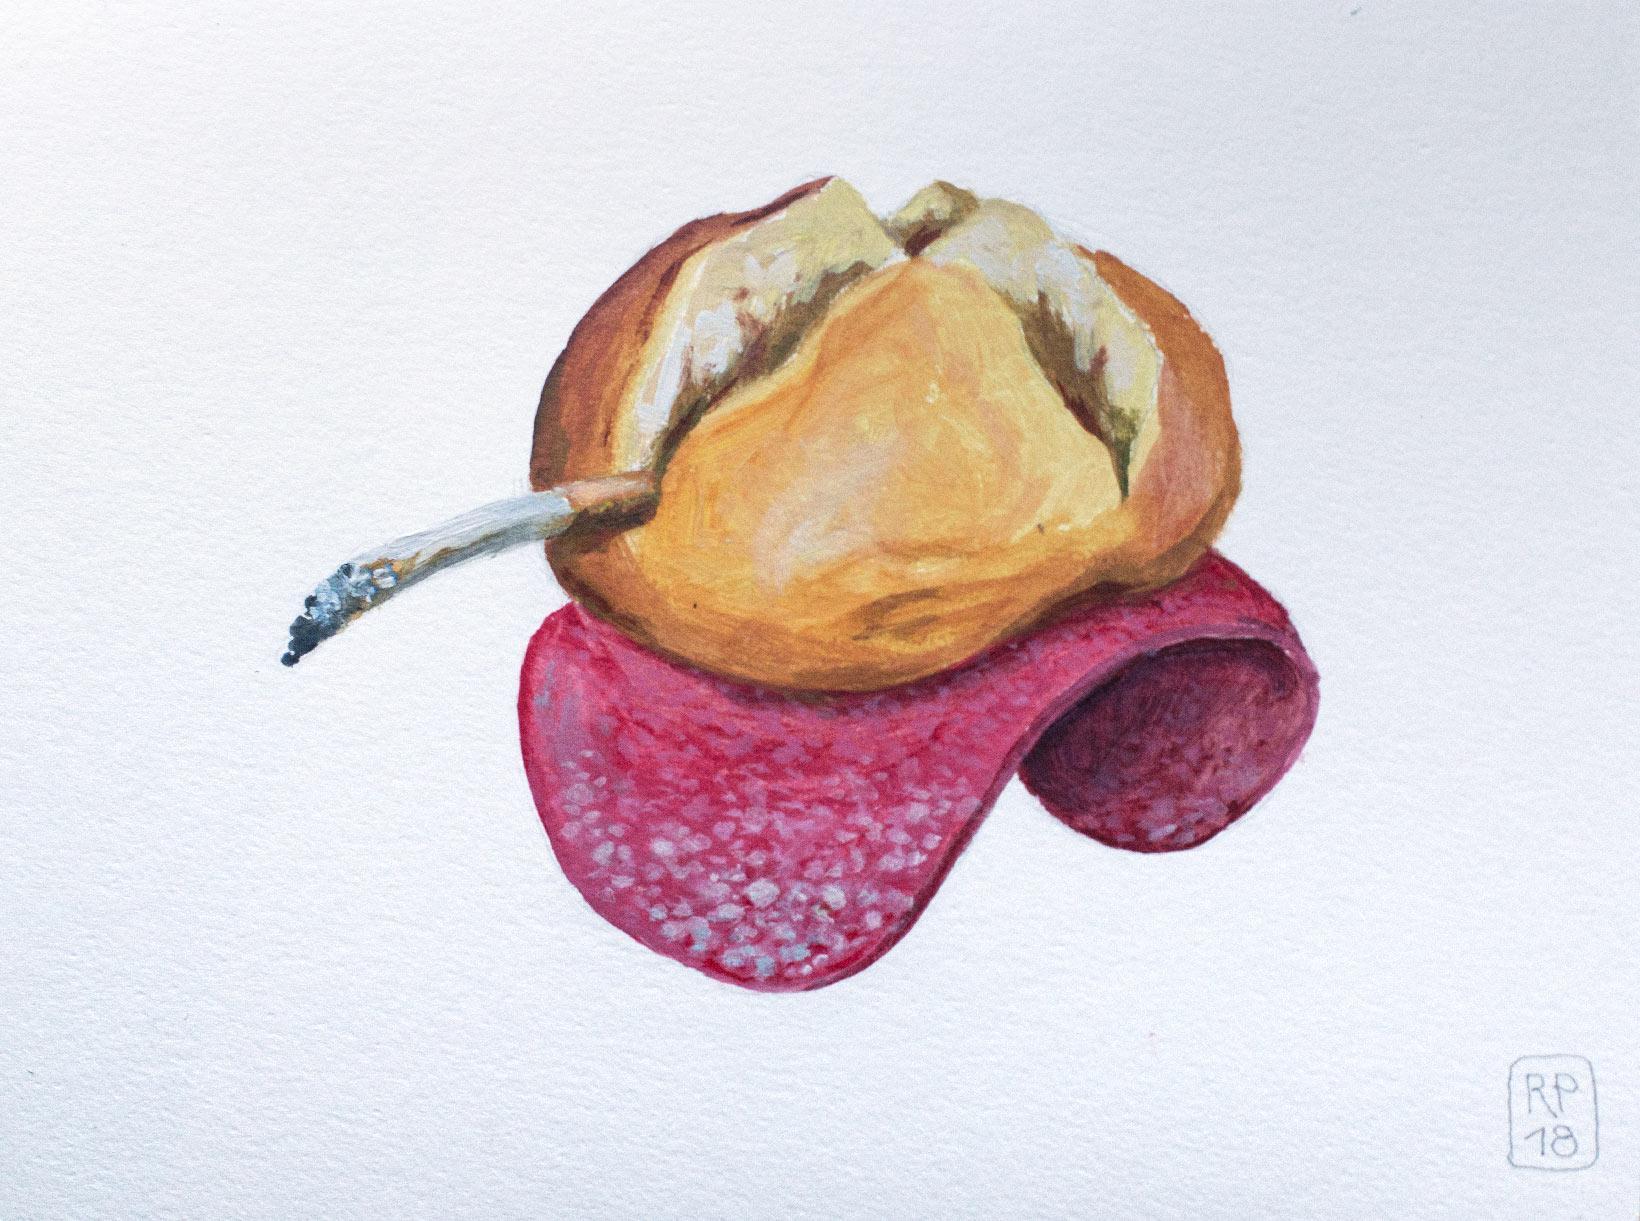 Angriff Malerei Acryl Brotschaften Robert Puls